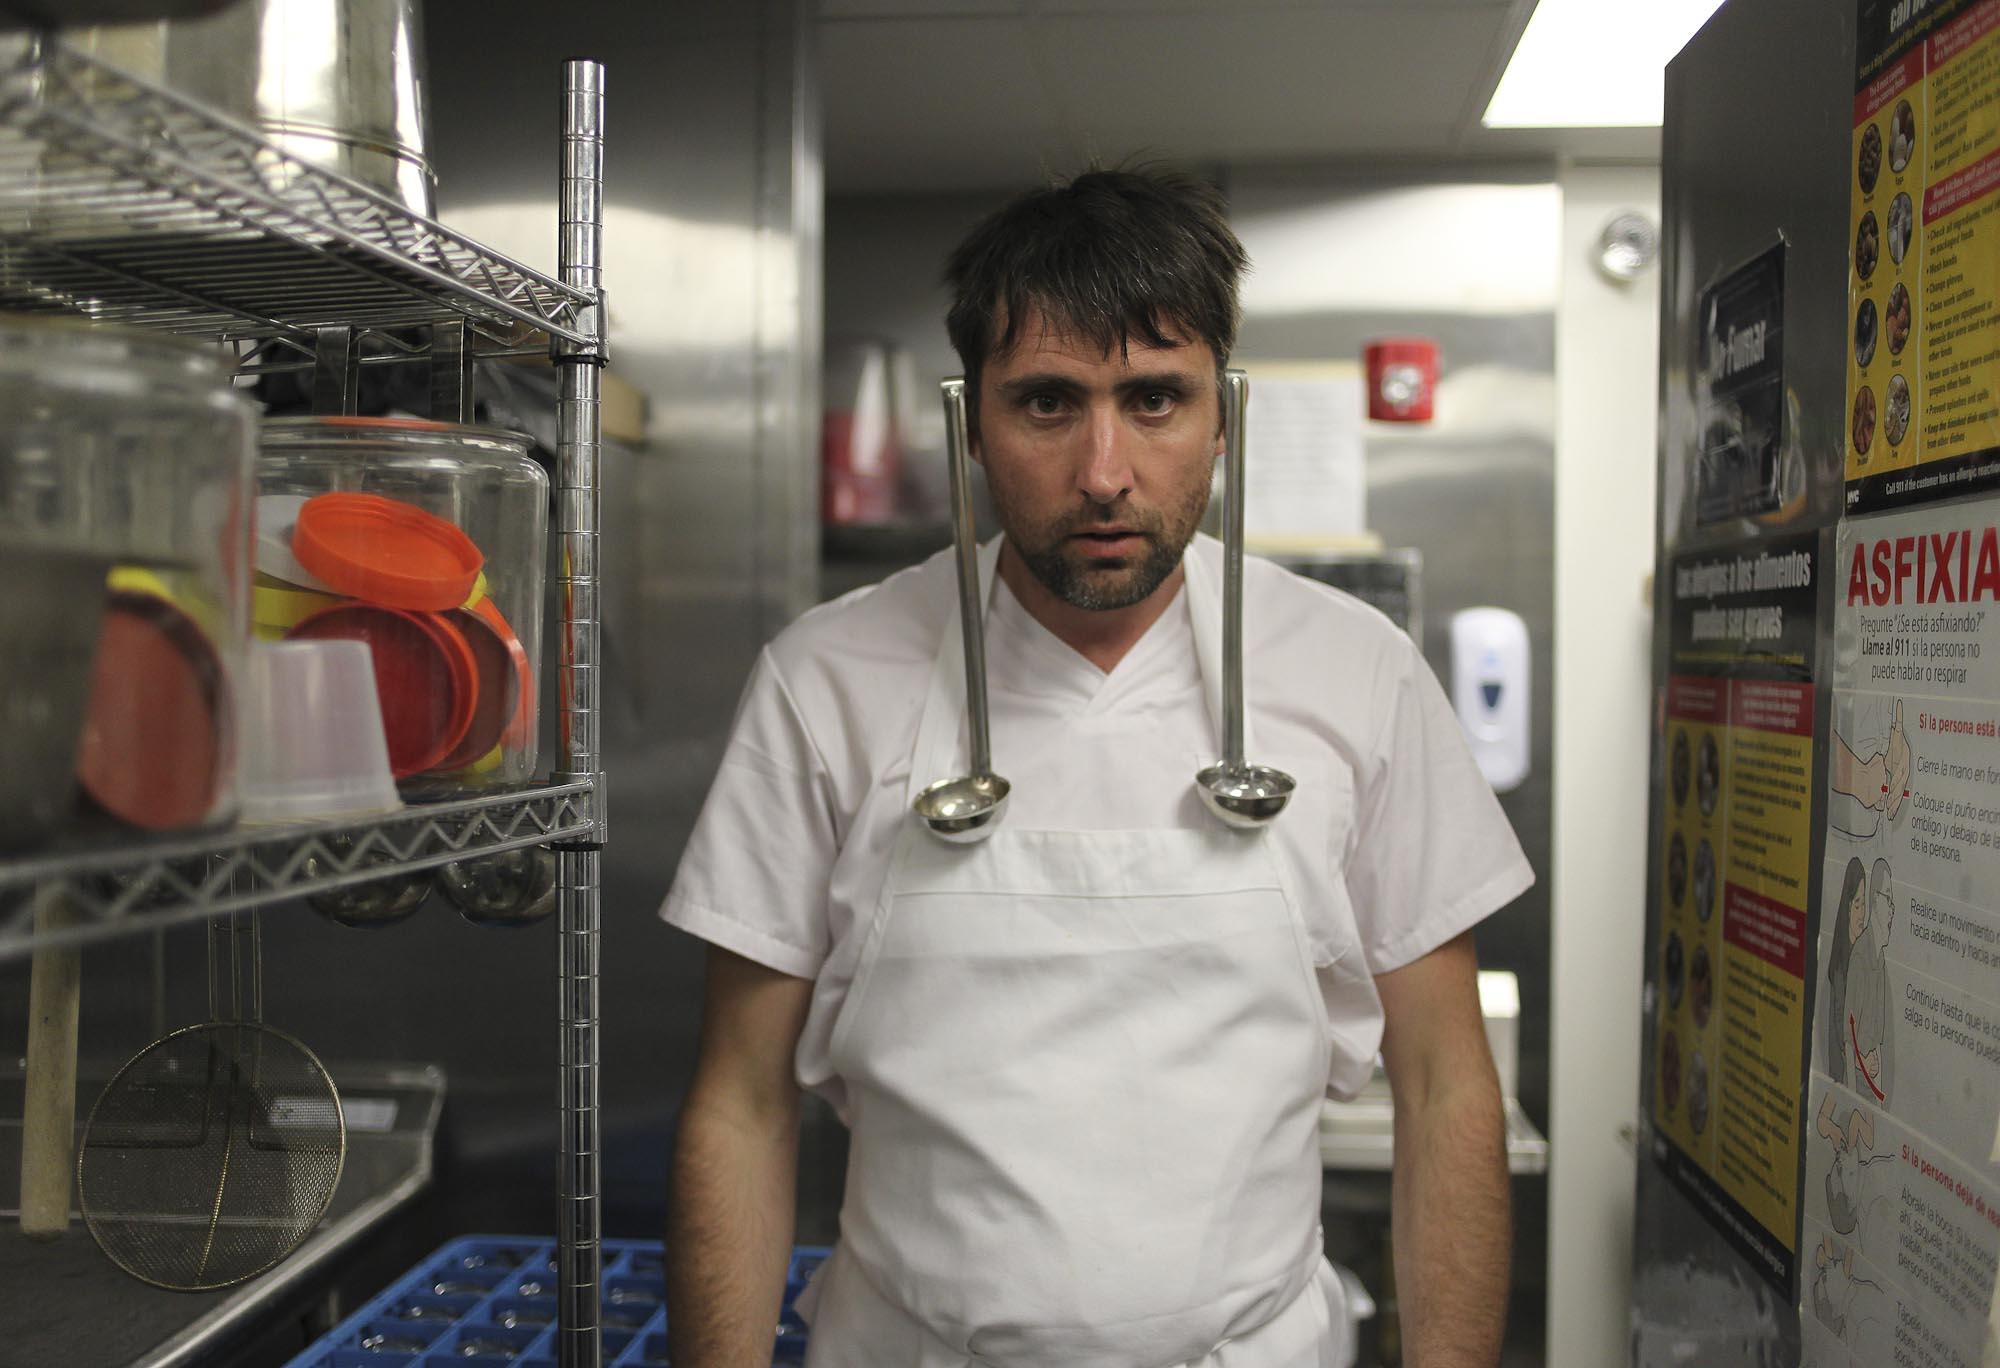 Inaki Aizpitarte, Le Fooding's 'Brooklyn Fling', 2012.